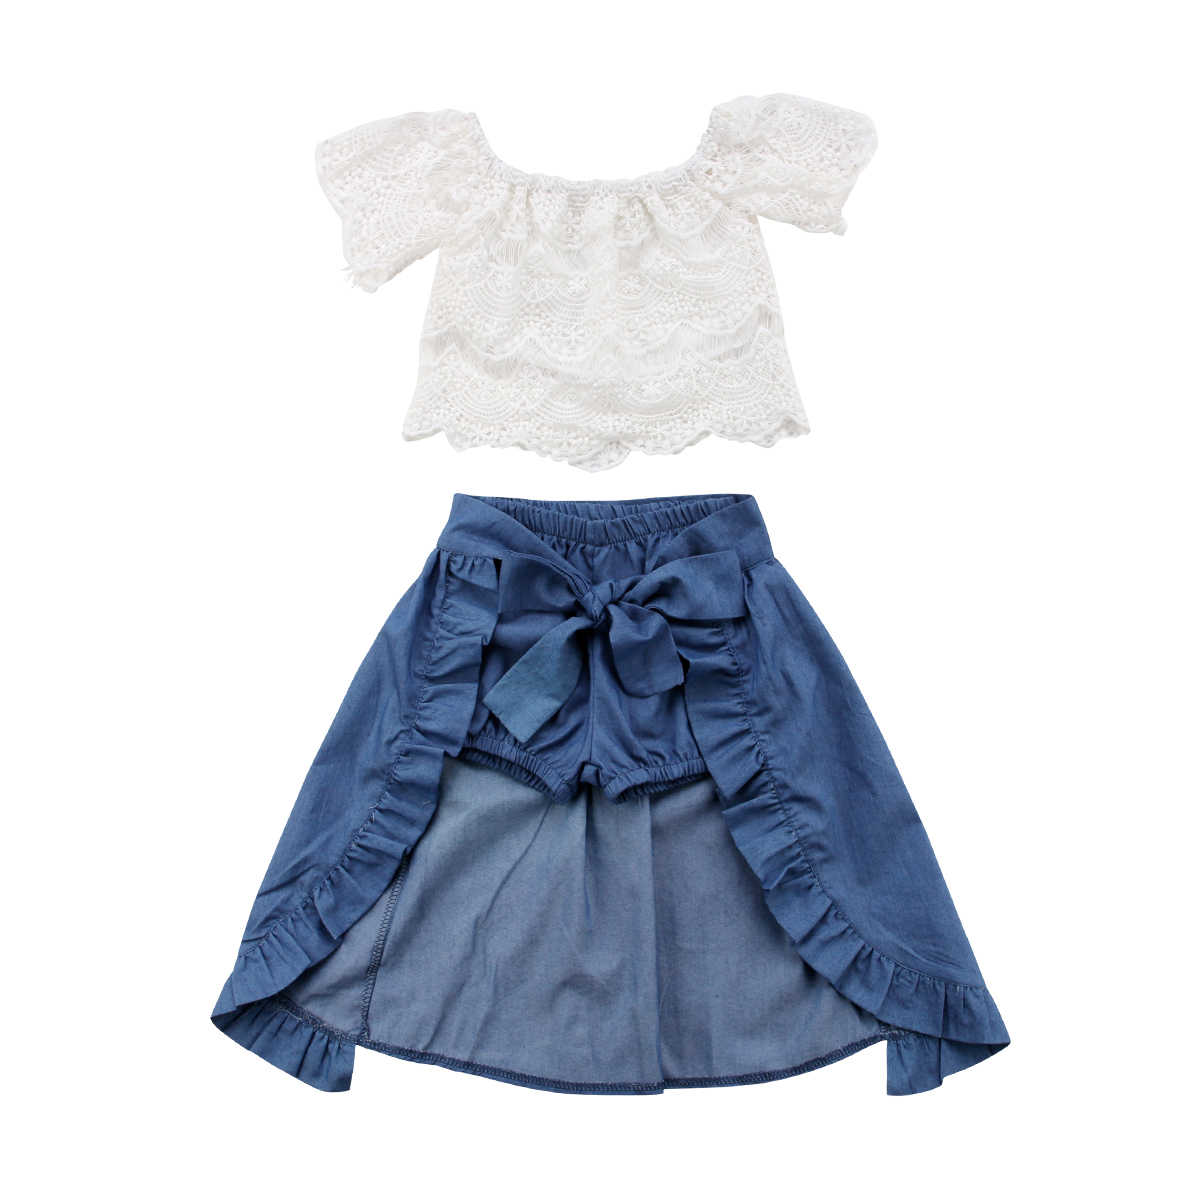 b00f3454ab Newborn Infant Kids Baby Girls Clothes Sets Lace Short Sleeve Off-shoulder  T-shirt